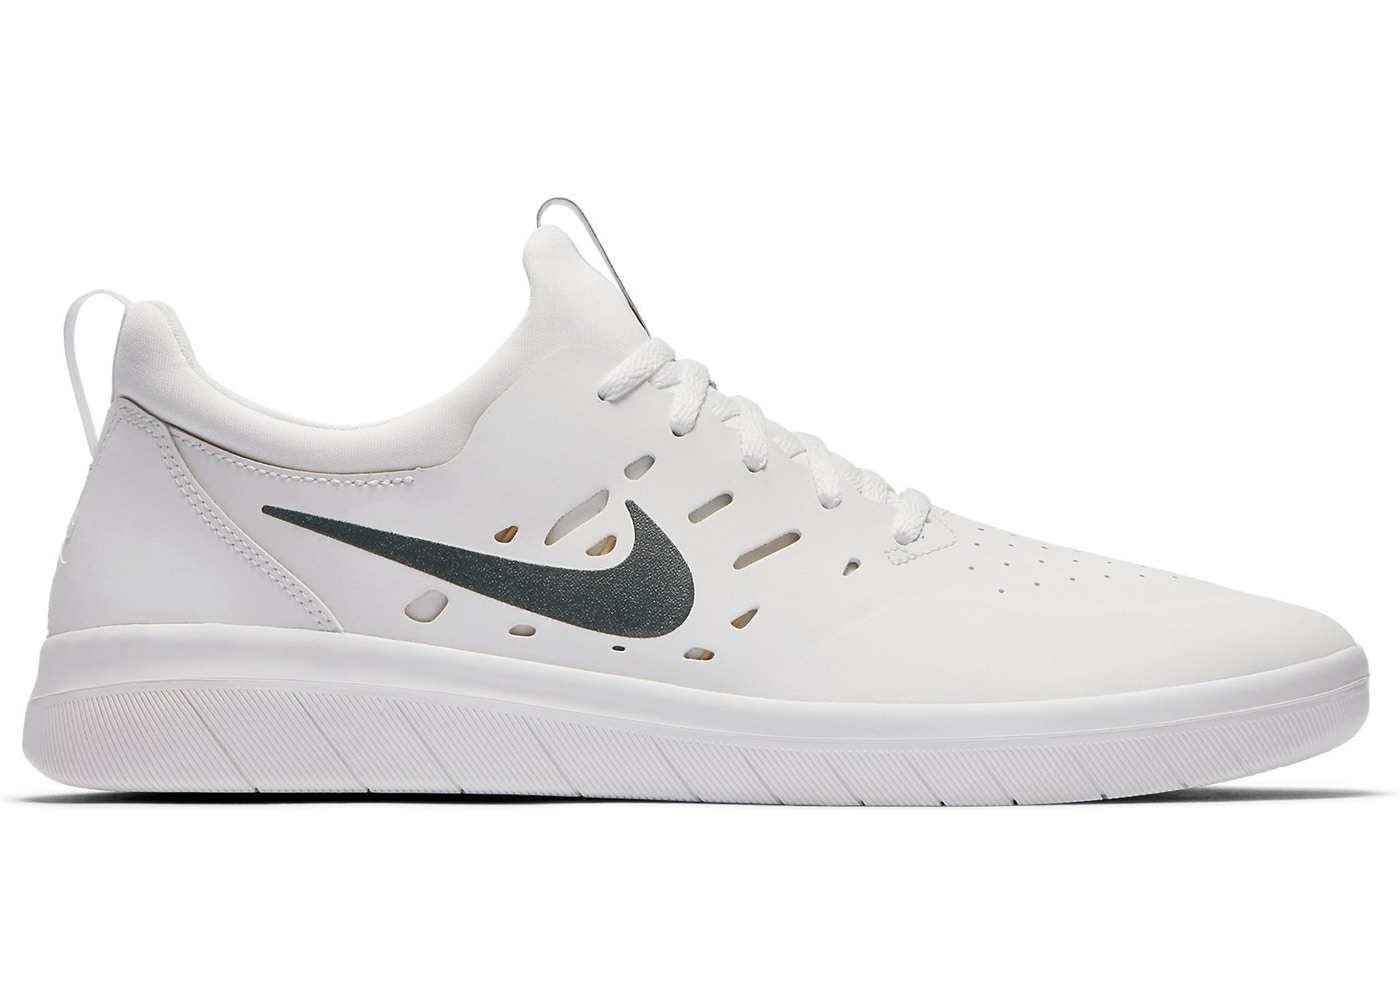 20187ff76a6c HypeAnalyzer · Nike SB Nyjah White Anthracite